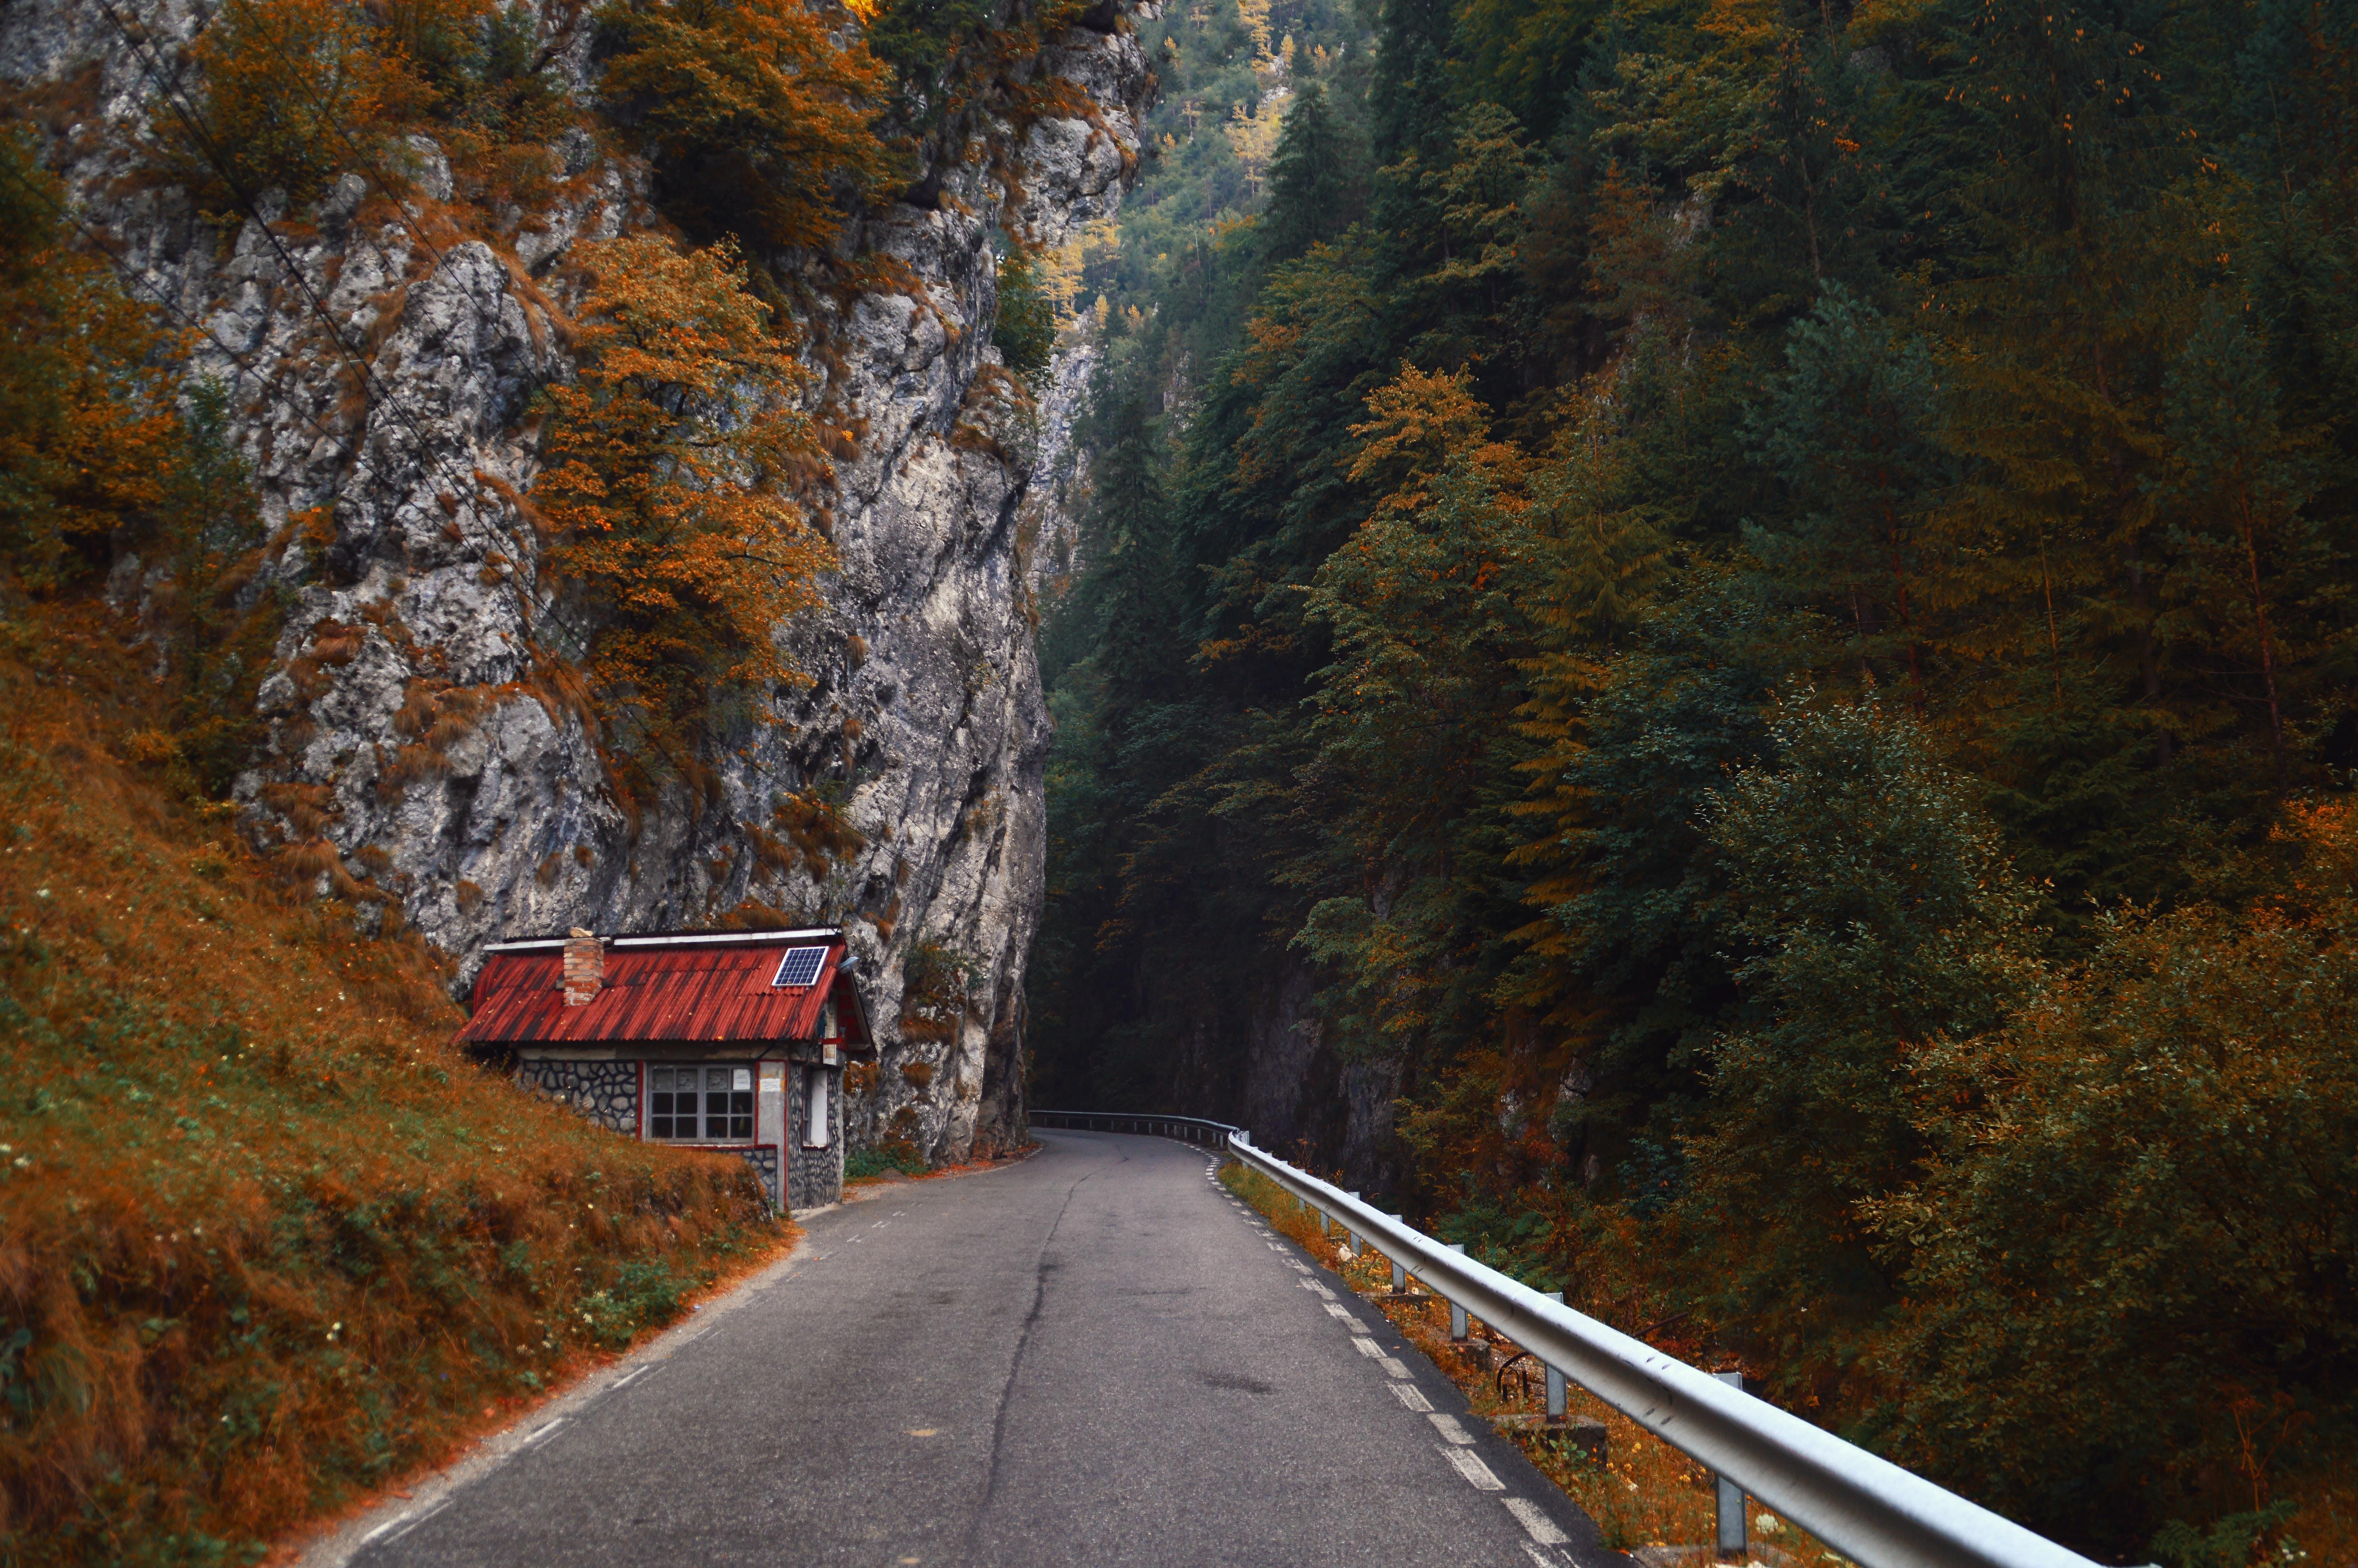 gray asphalt road in between rock mountains